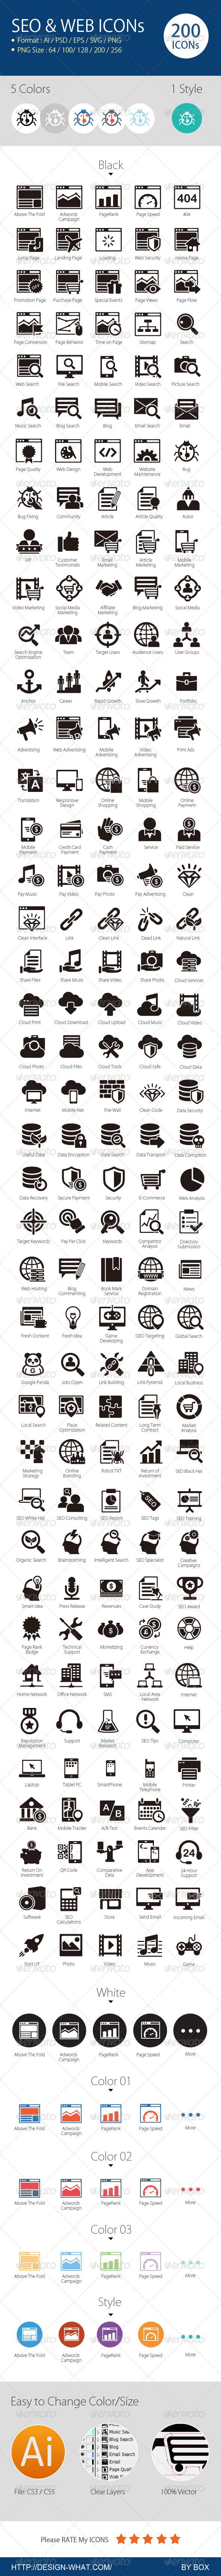 SEO & Web Icons - Web Icons